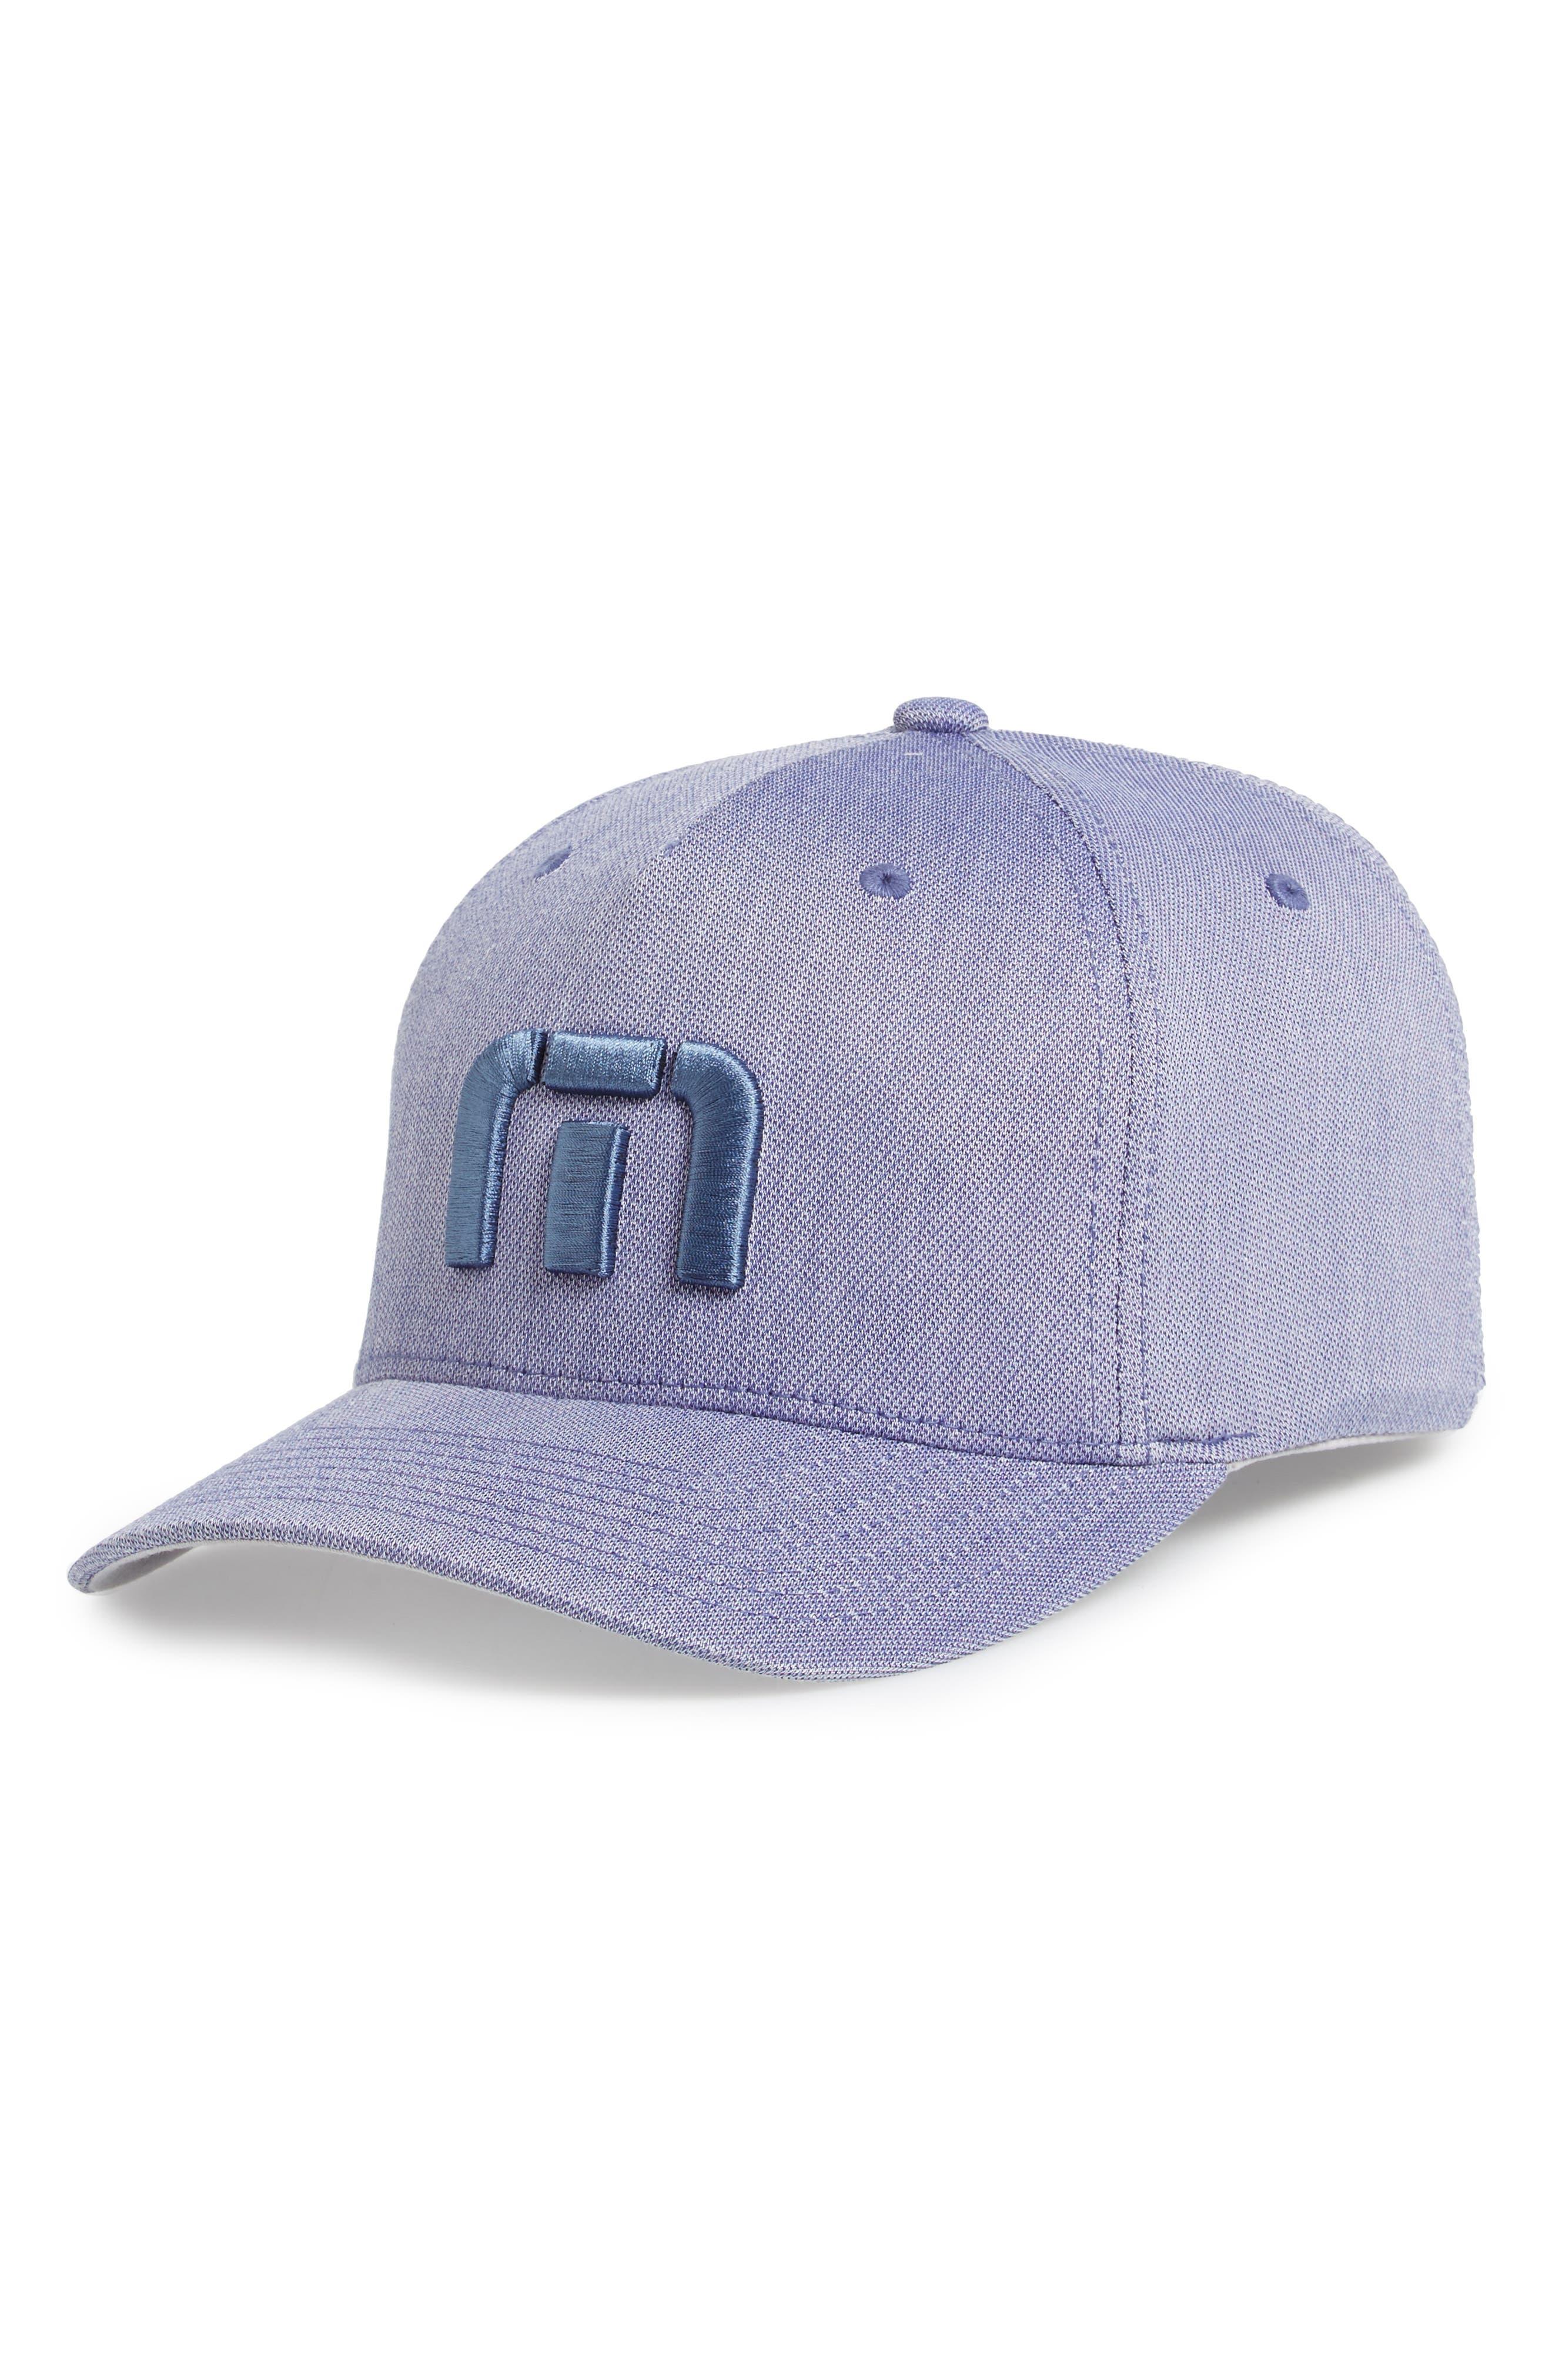 Alternate Image 1 Selected - Travis Mathew Van Dyke Flex Fit Baseball Cap